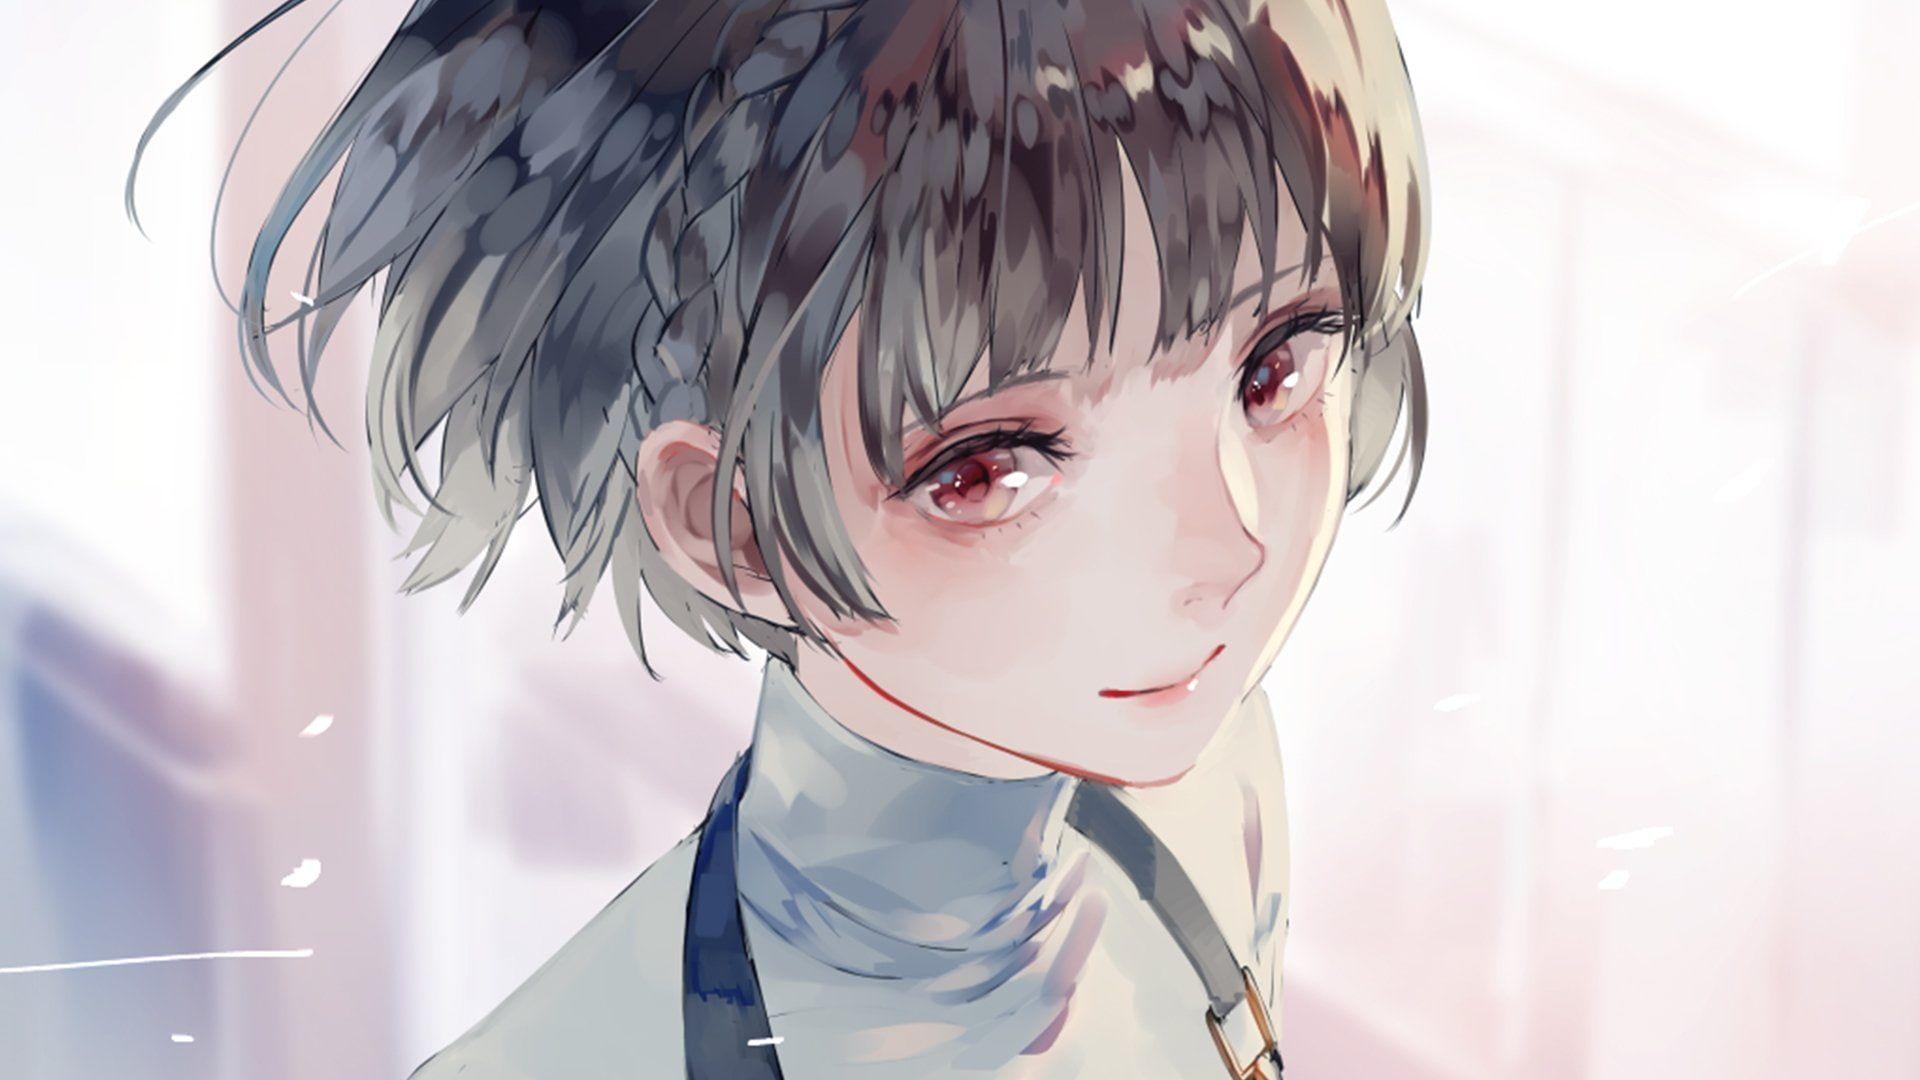 Persona Persona 5 Anime Makoto Niijima Video Game 1080p Wallpaper Hdwallpaper Desktop Makoto Niijima Persona 5 Persona 5 Makoto